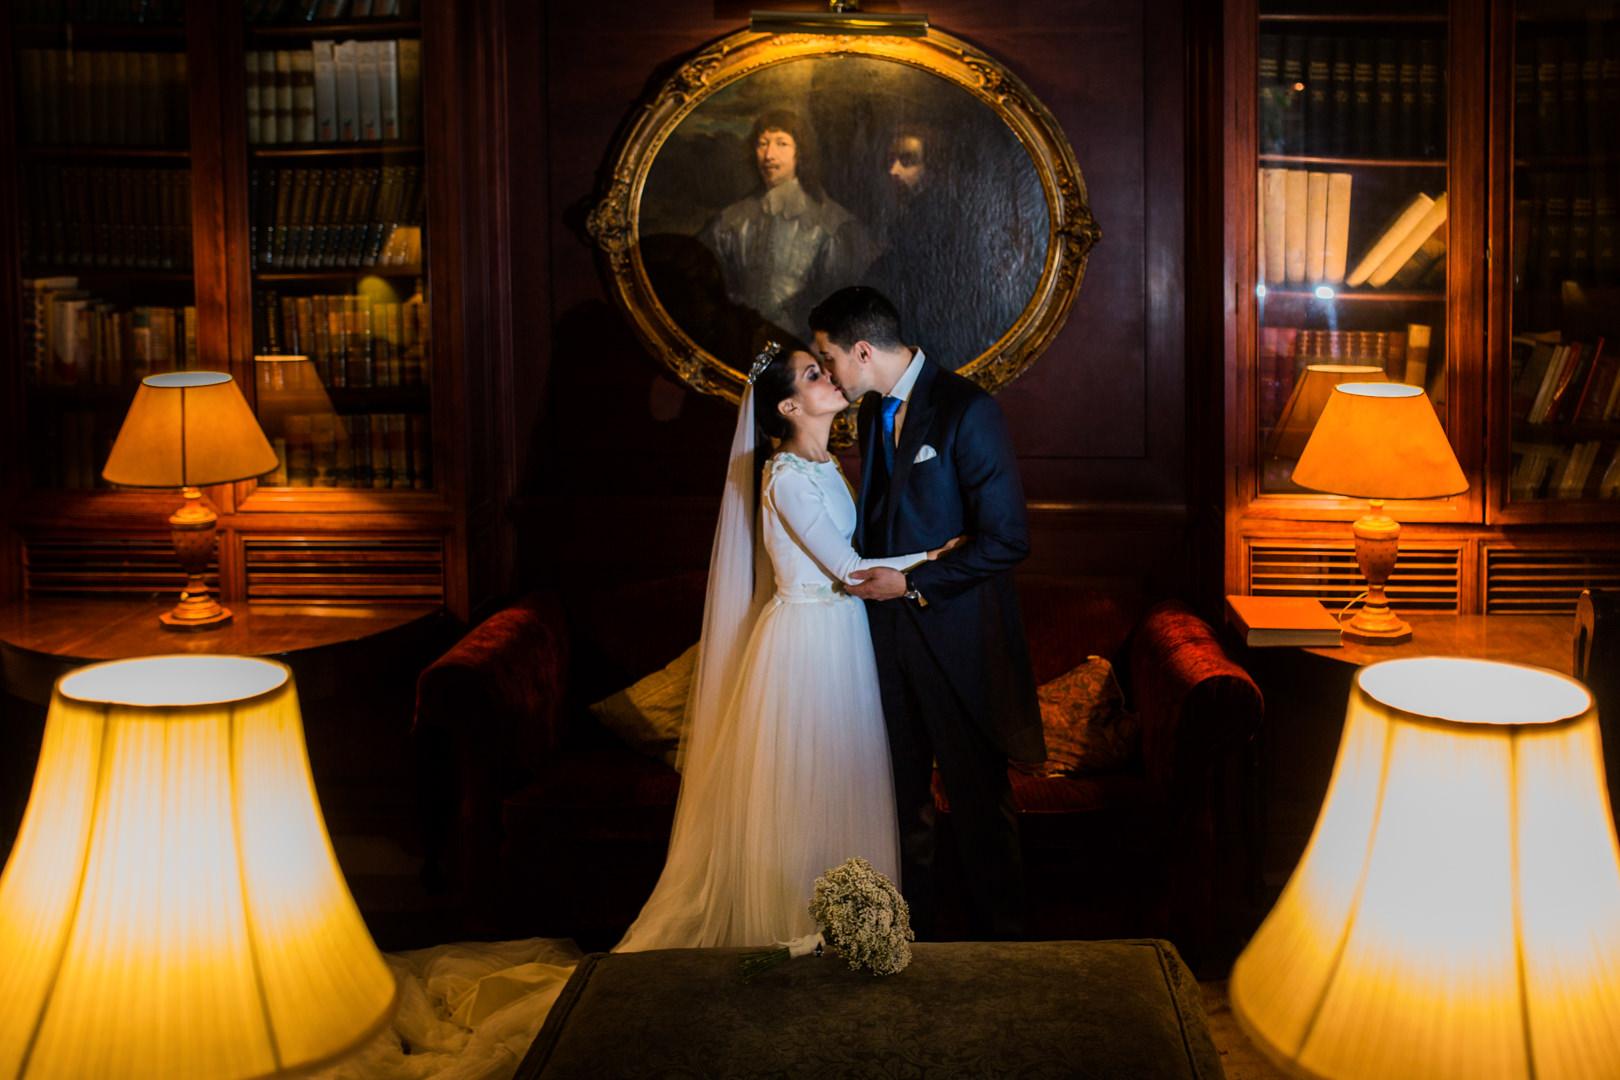 Boda-sevilla-Wedding-engagement-Rafael-Torres-fotografo-bodas-sevilla-madrid-barcelona-wedding-photographer--43.jpg